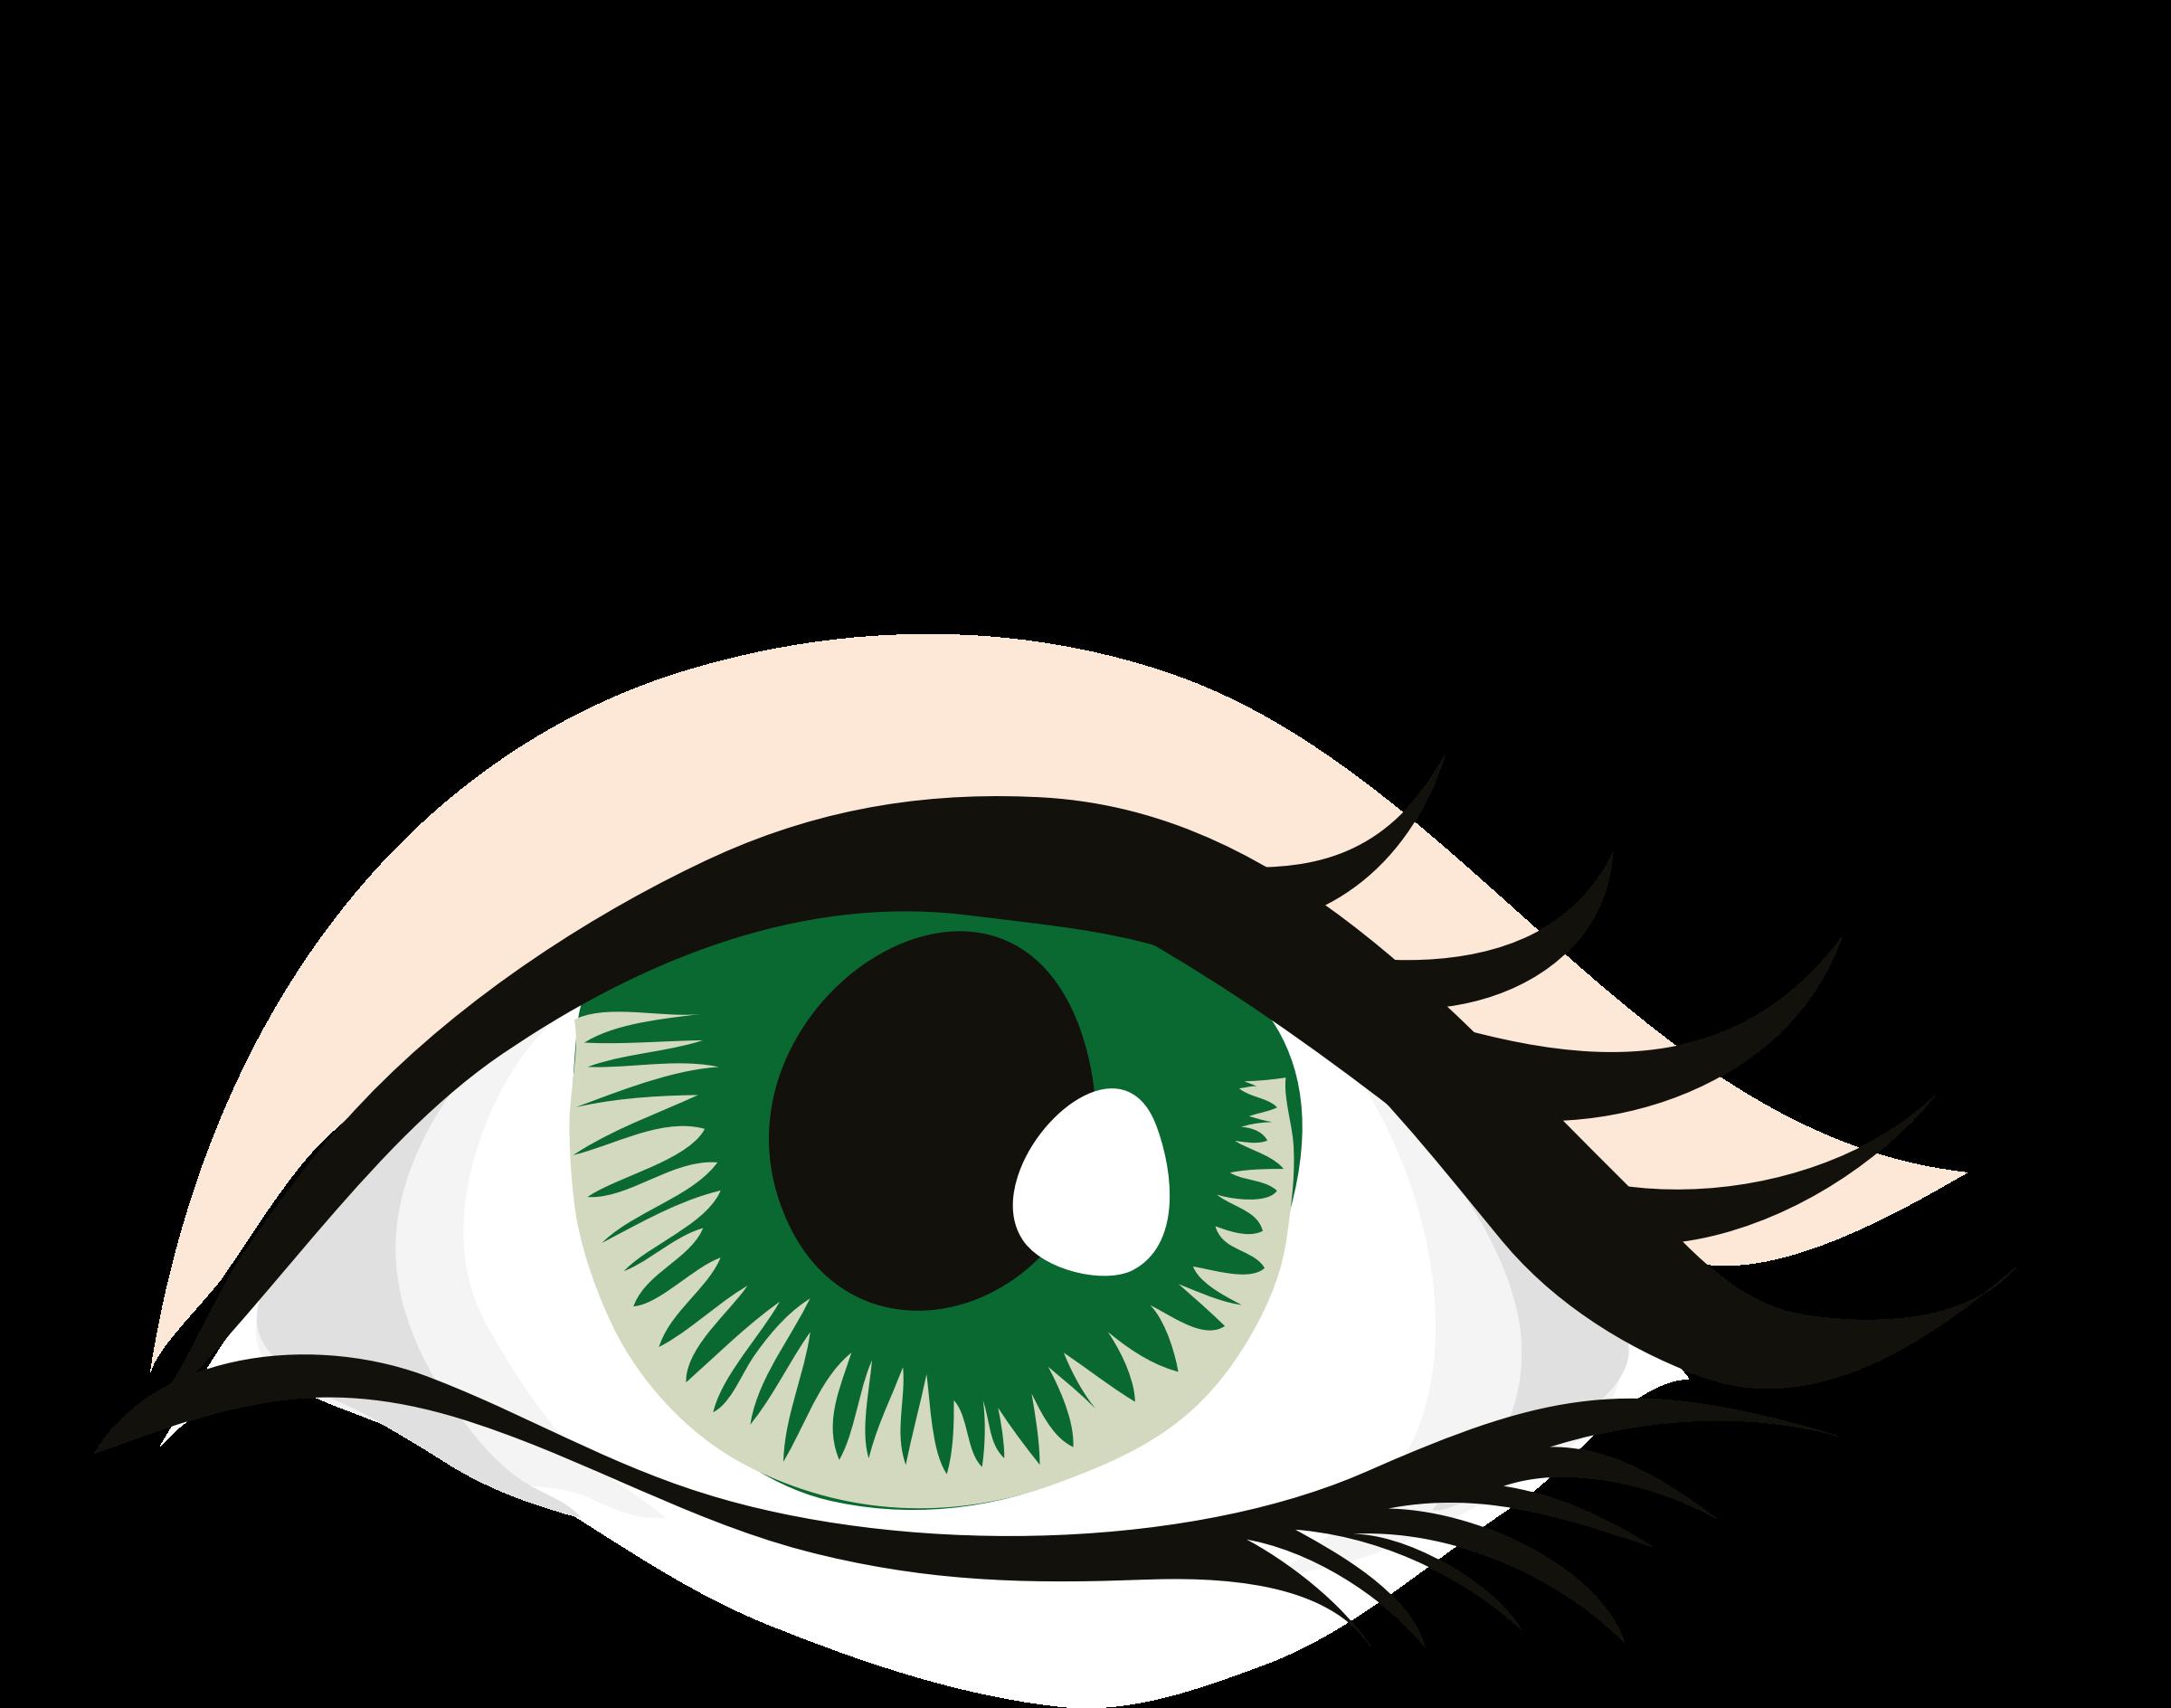 Eyelash clipart realistic. Eye big image png